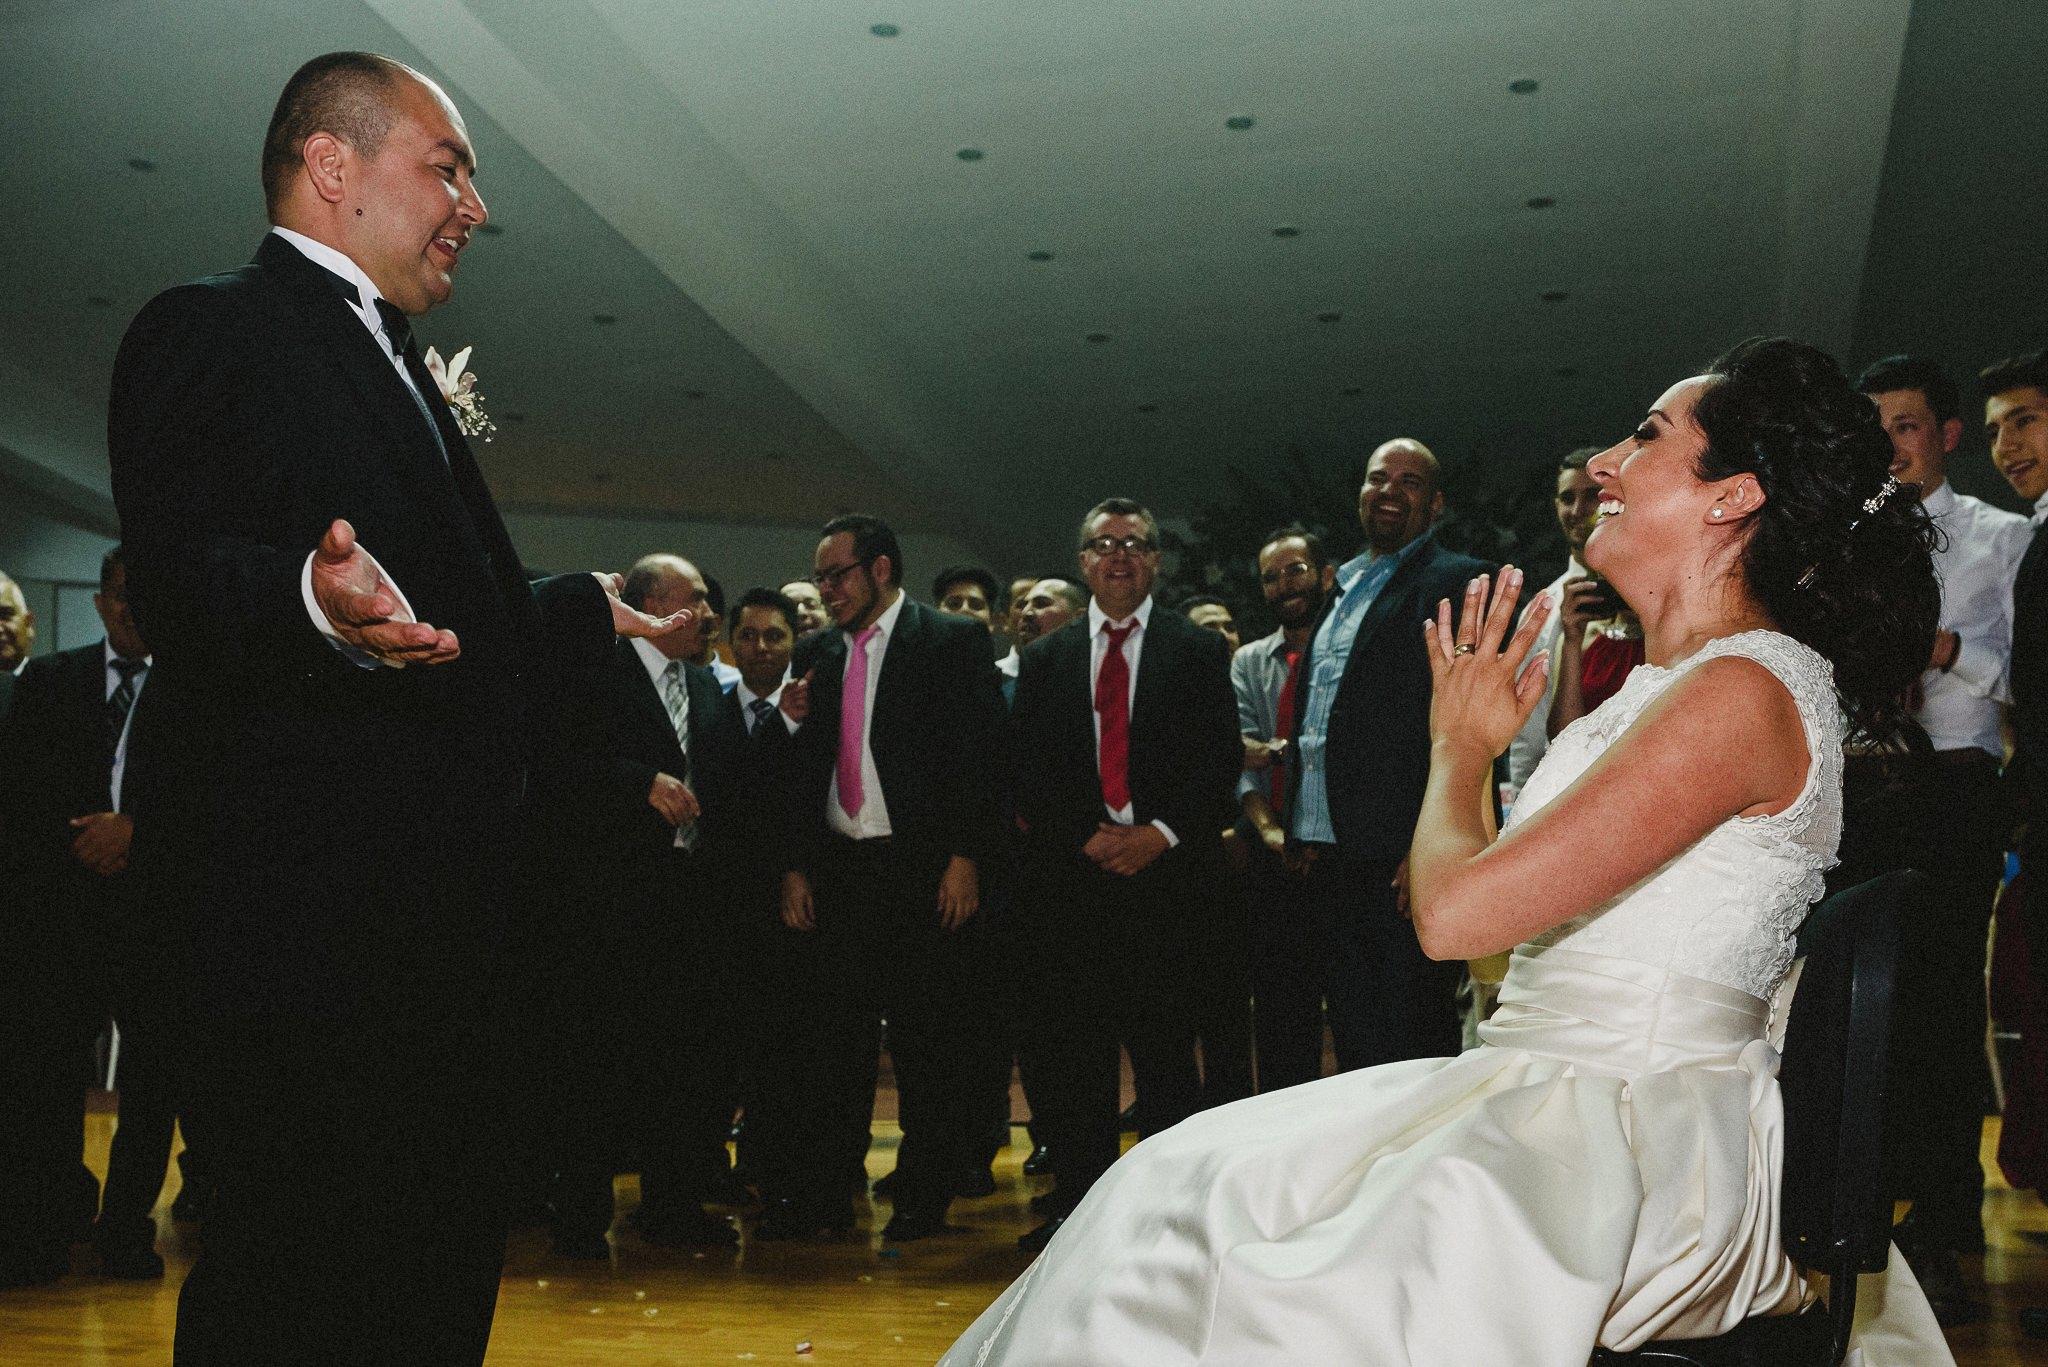 Wedding-Boda-Tulancingo-Hidalgo-Salon-Essenzia-Luis-Houdin-70-film